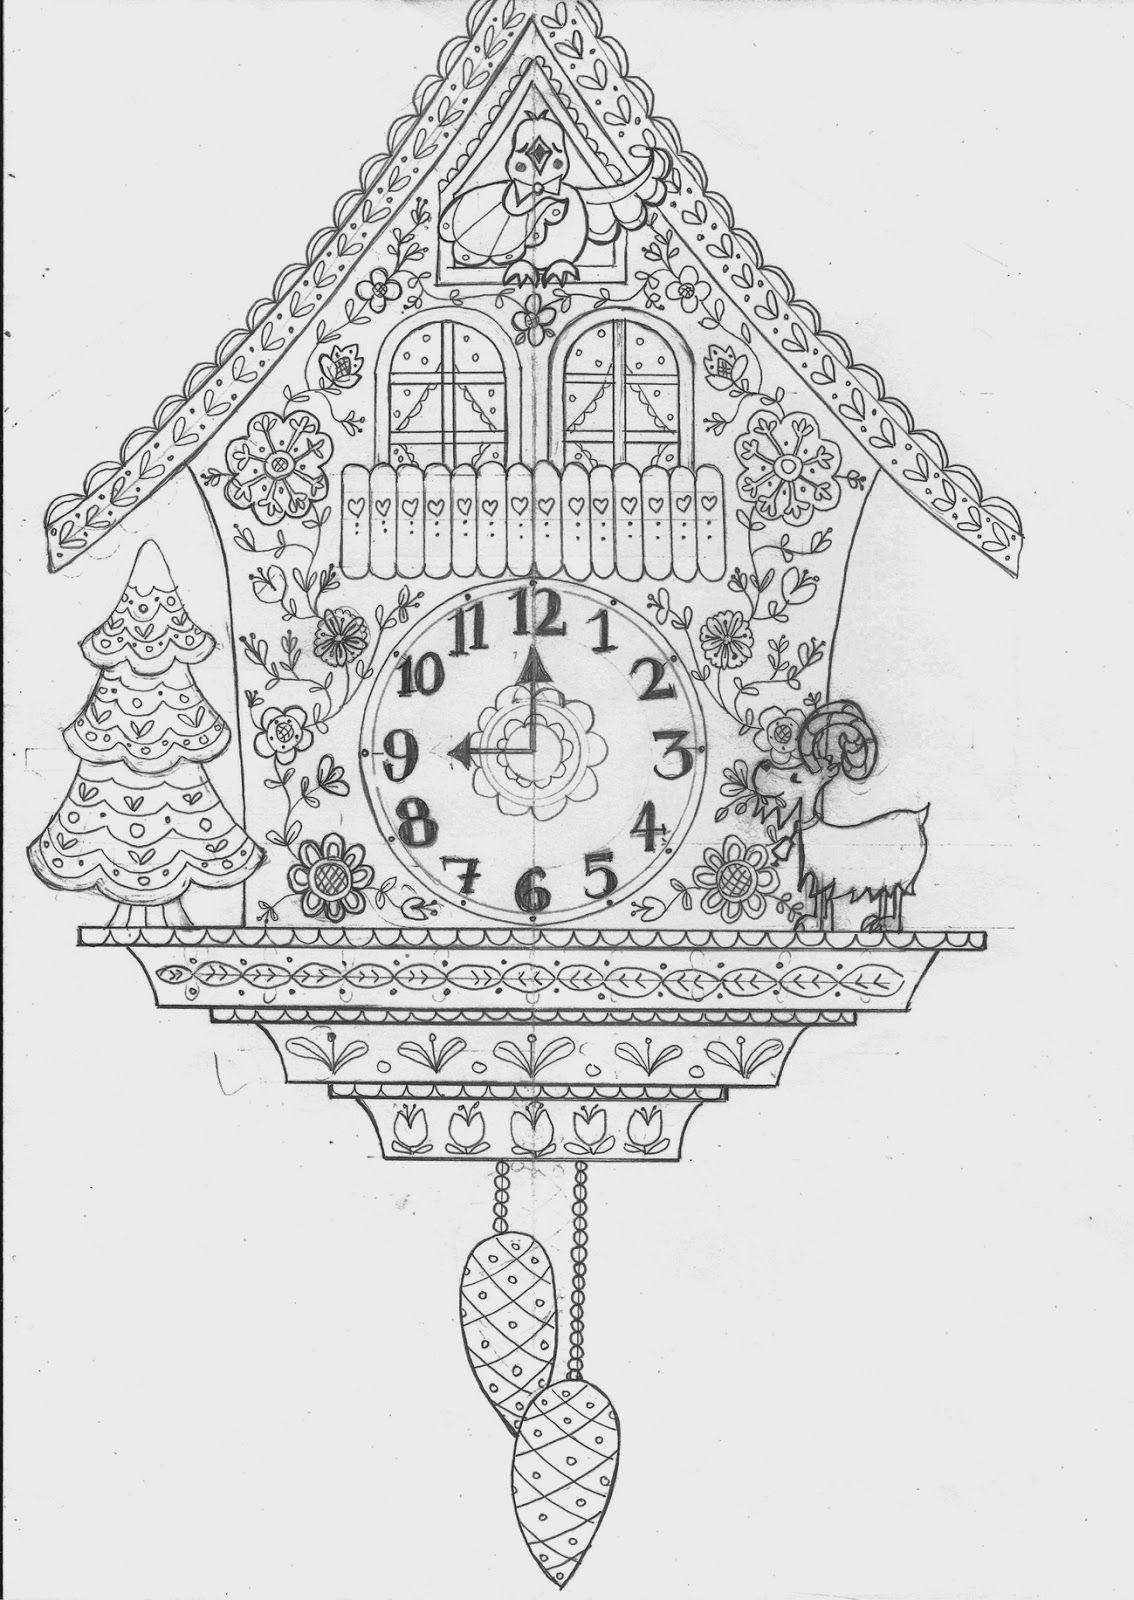 Nanette Regan S Adventures Cuckoo Clocks